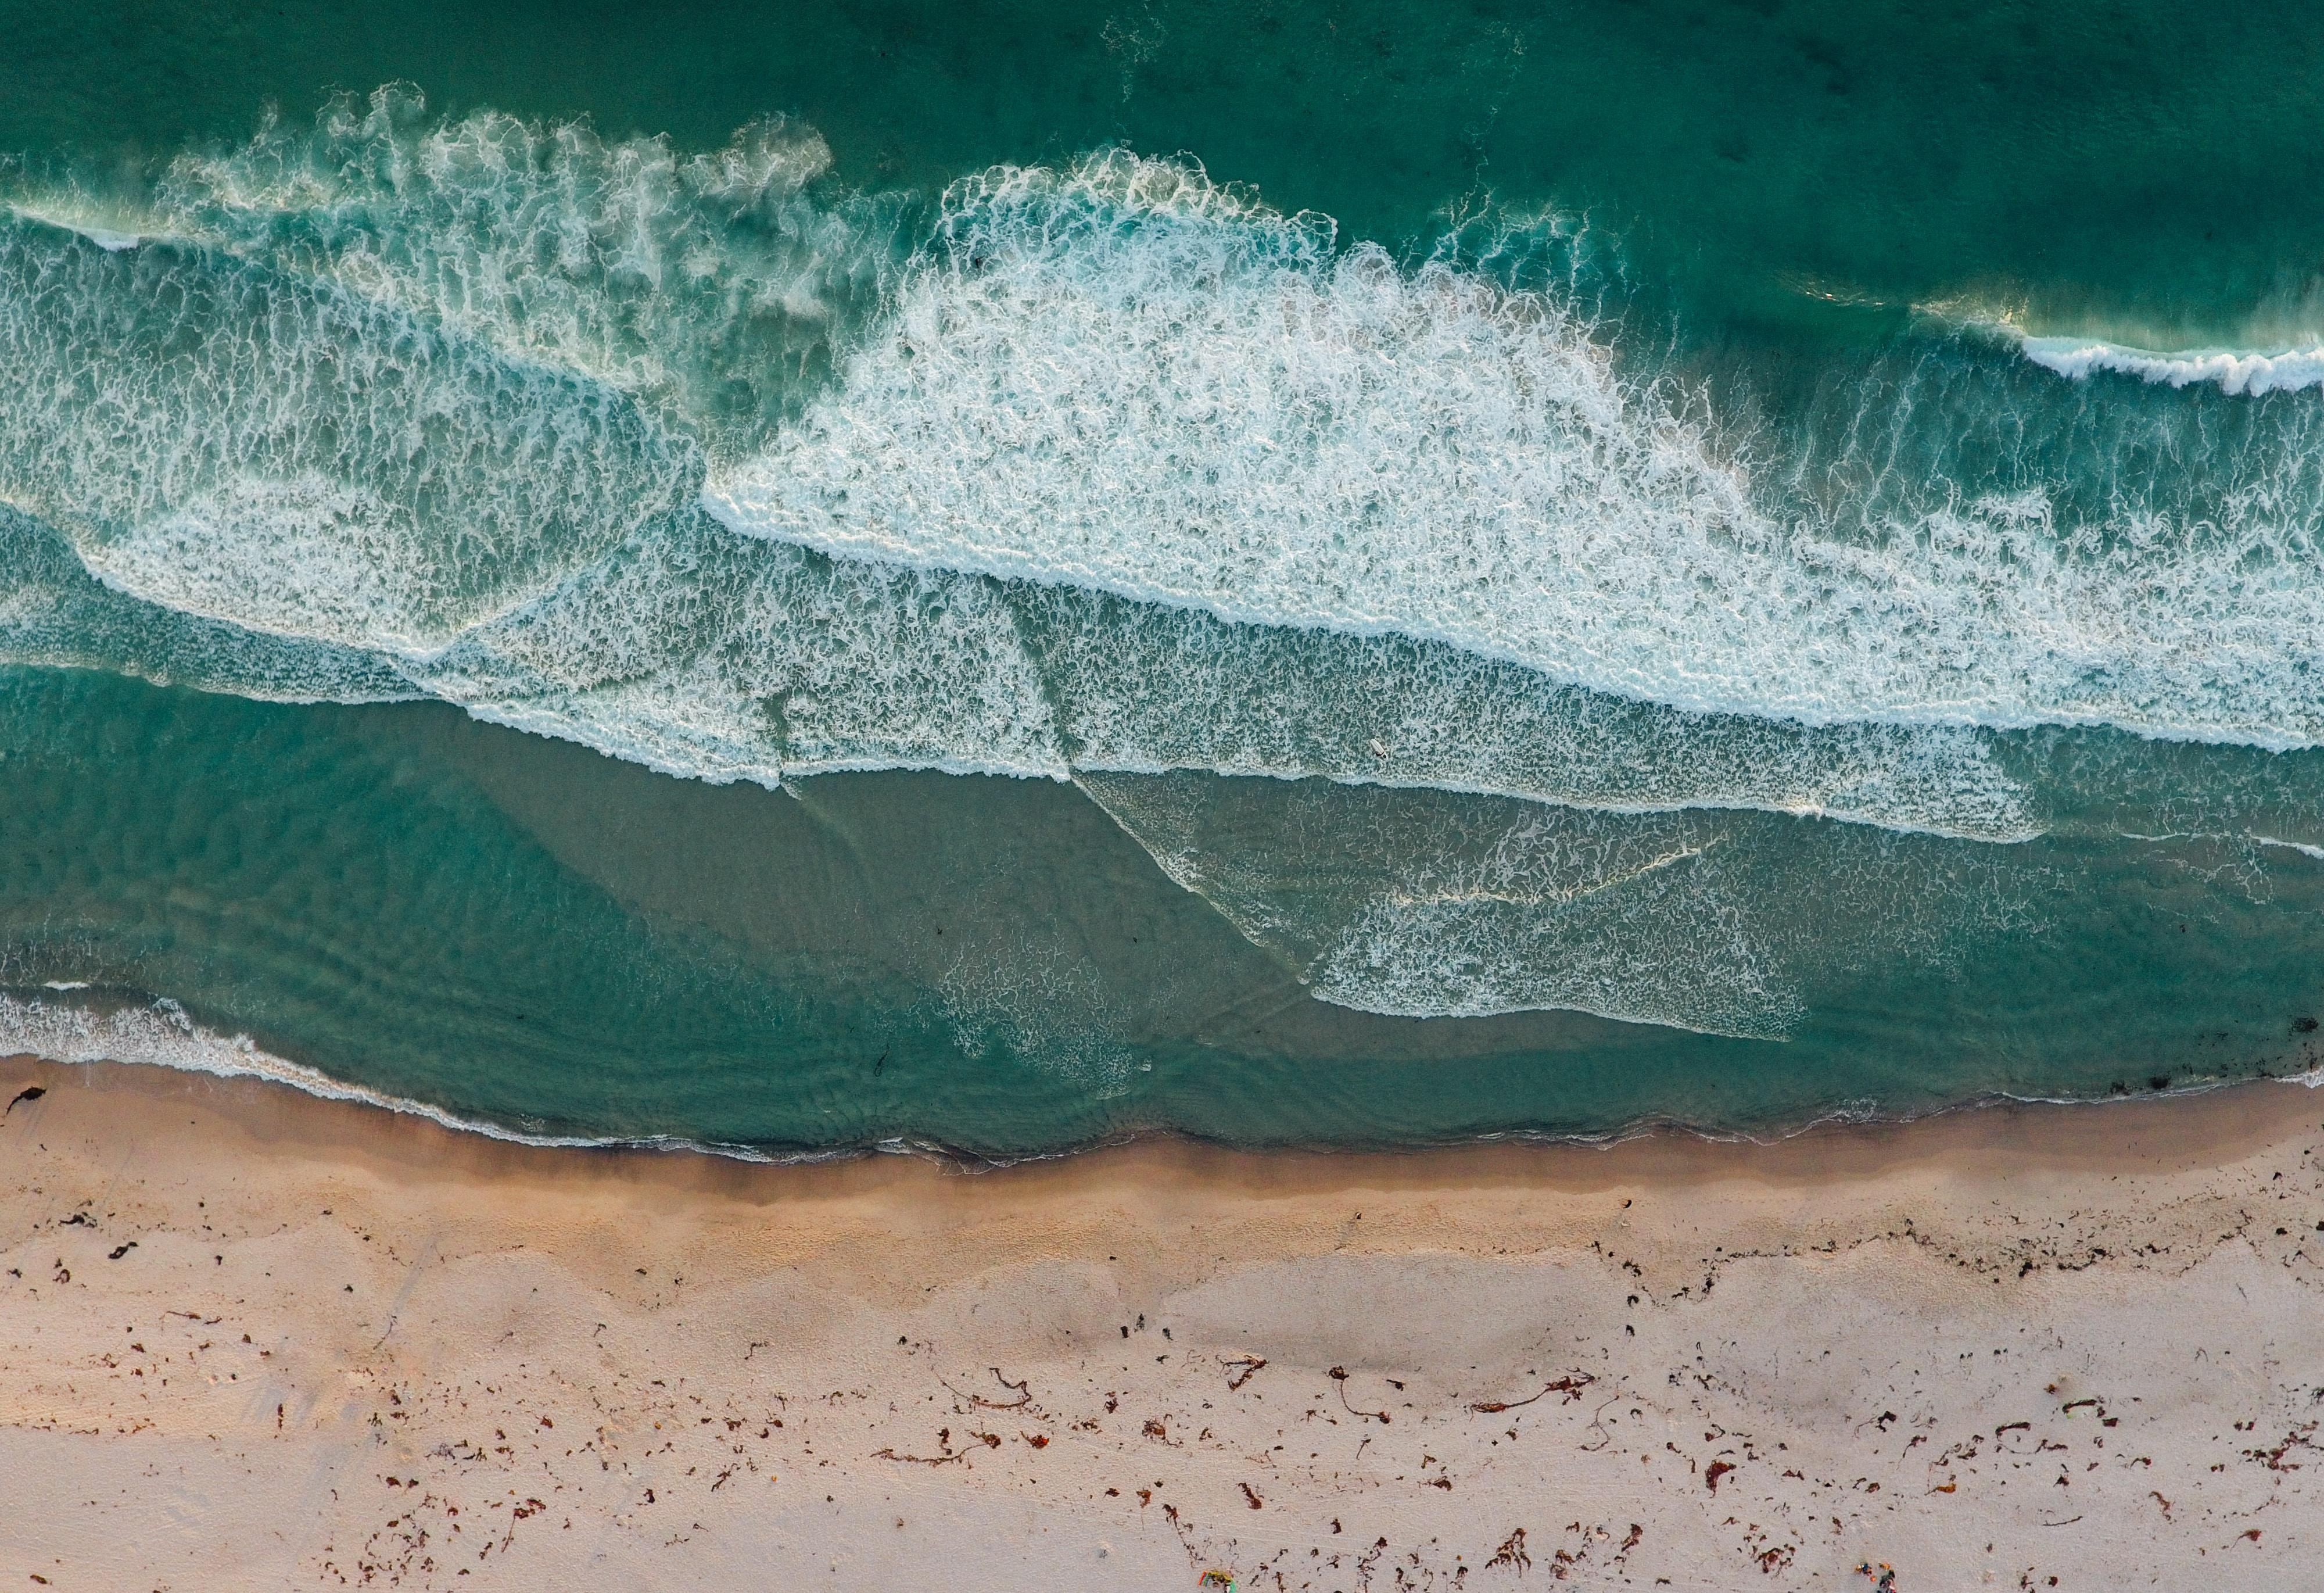 sea and shore at daytime